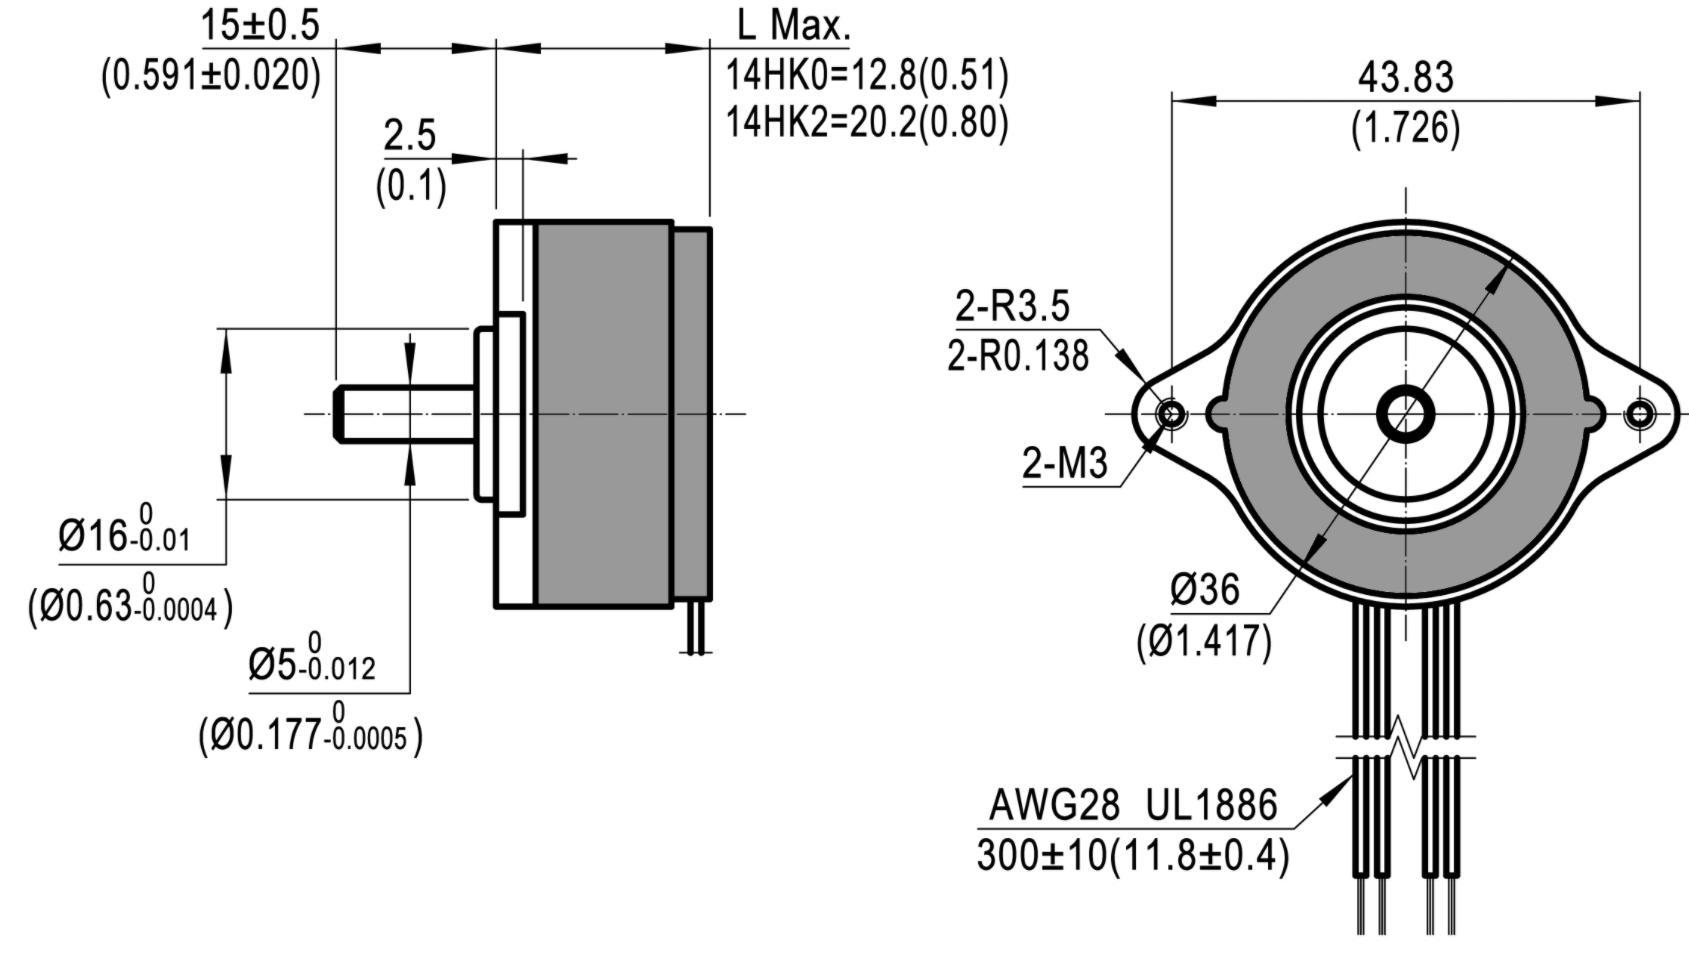 154HK Maße flache Bauform 0.9° Schrittwinkel